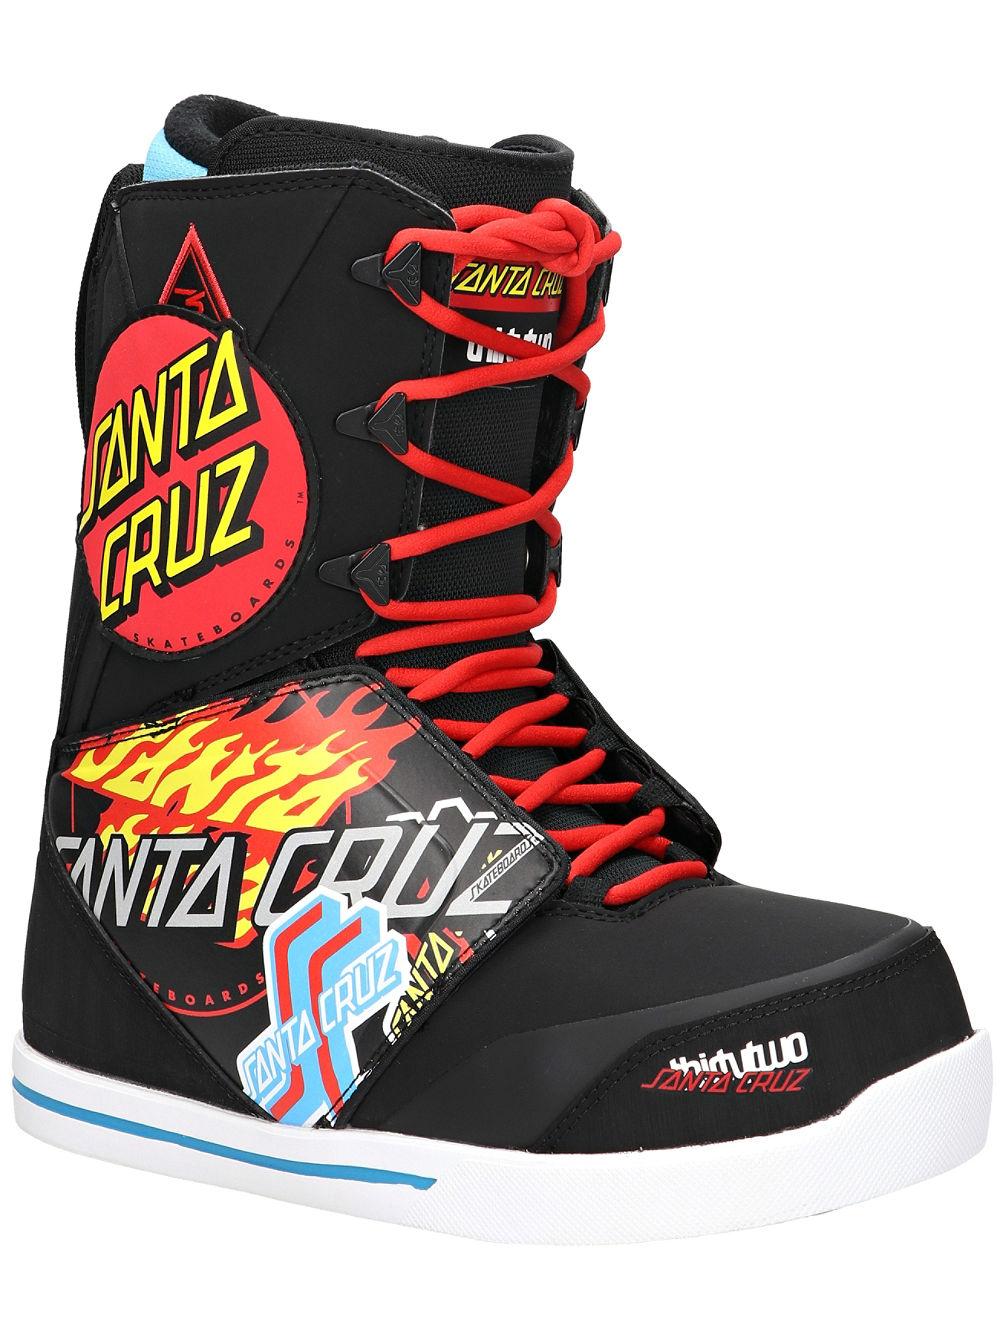 Compra ThirtyTwo Santa Cruz Lashed 2019 Scarponi da snowboard online su  blue-tomato.com db19820e6f0